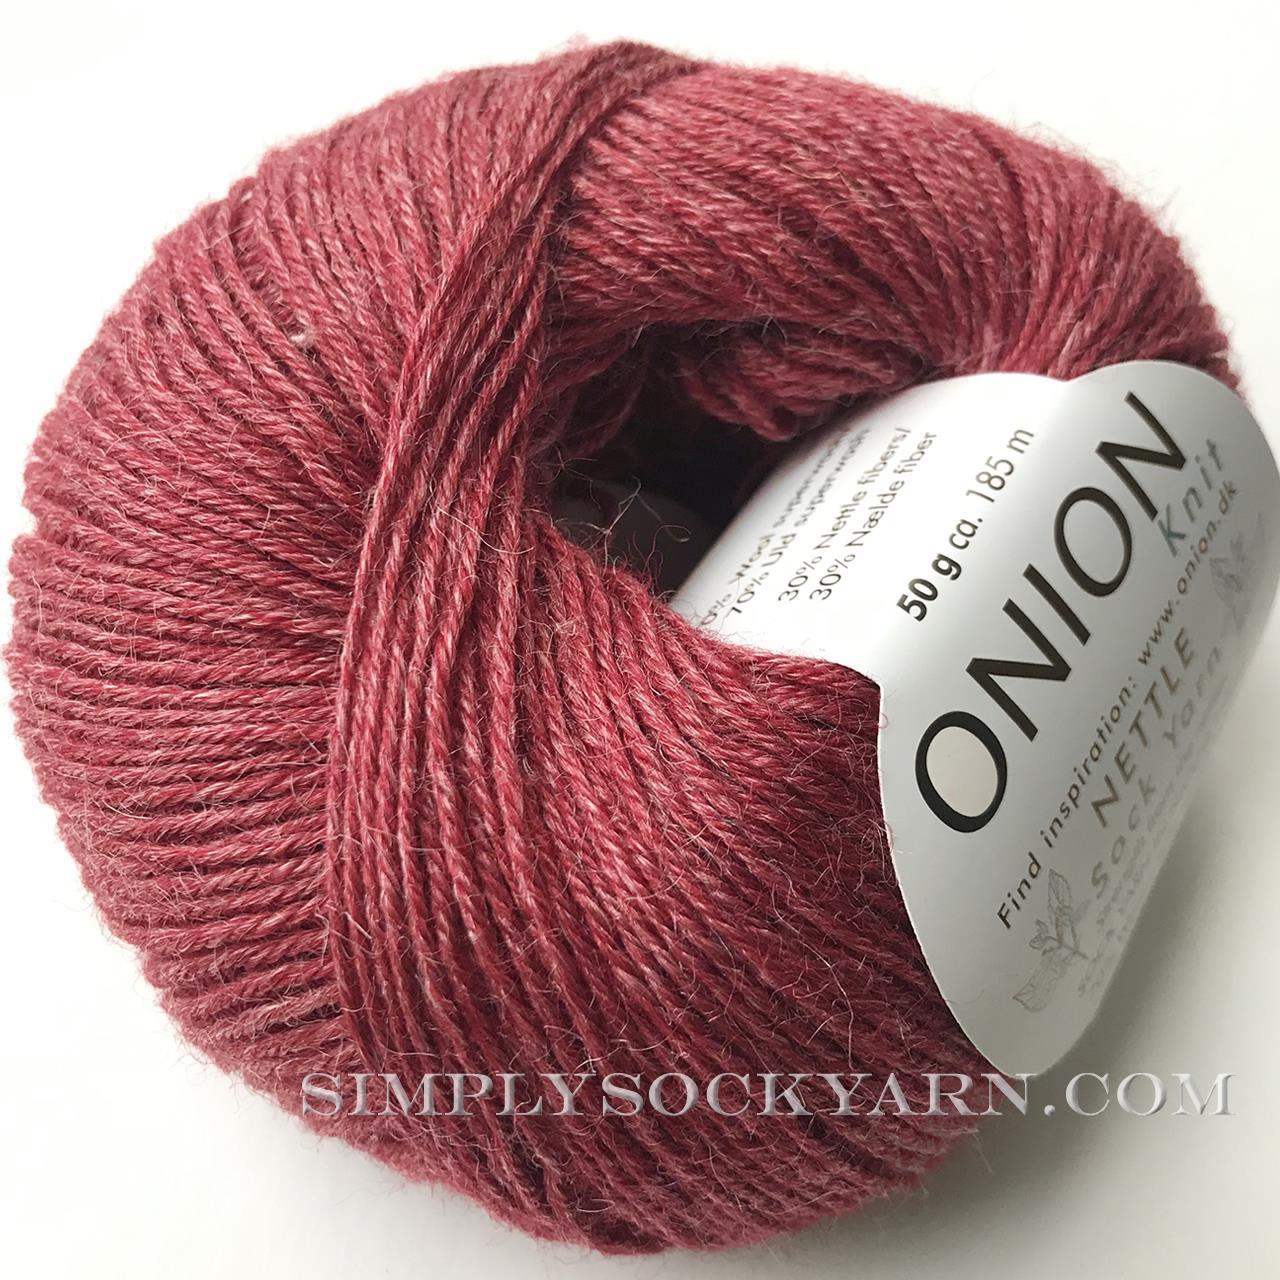 OY Nettle Sock 1008 Dark Red -